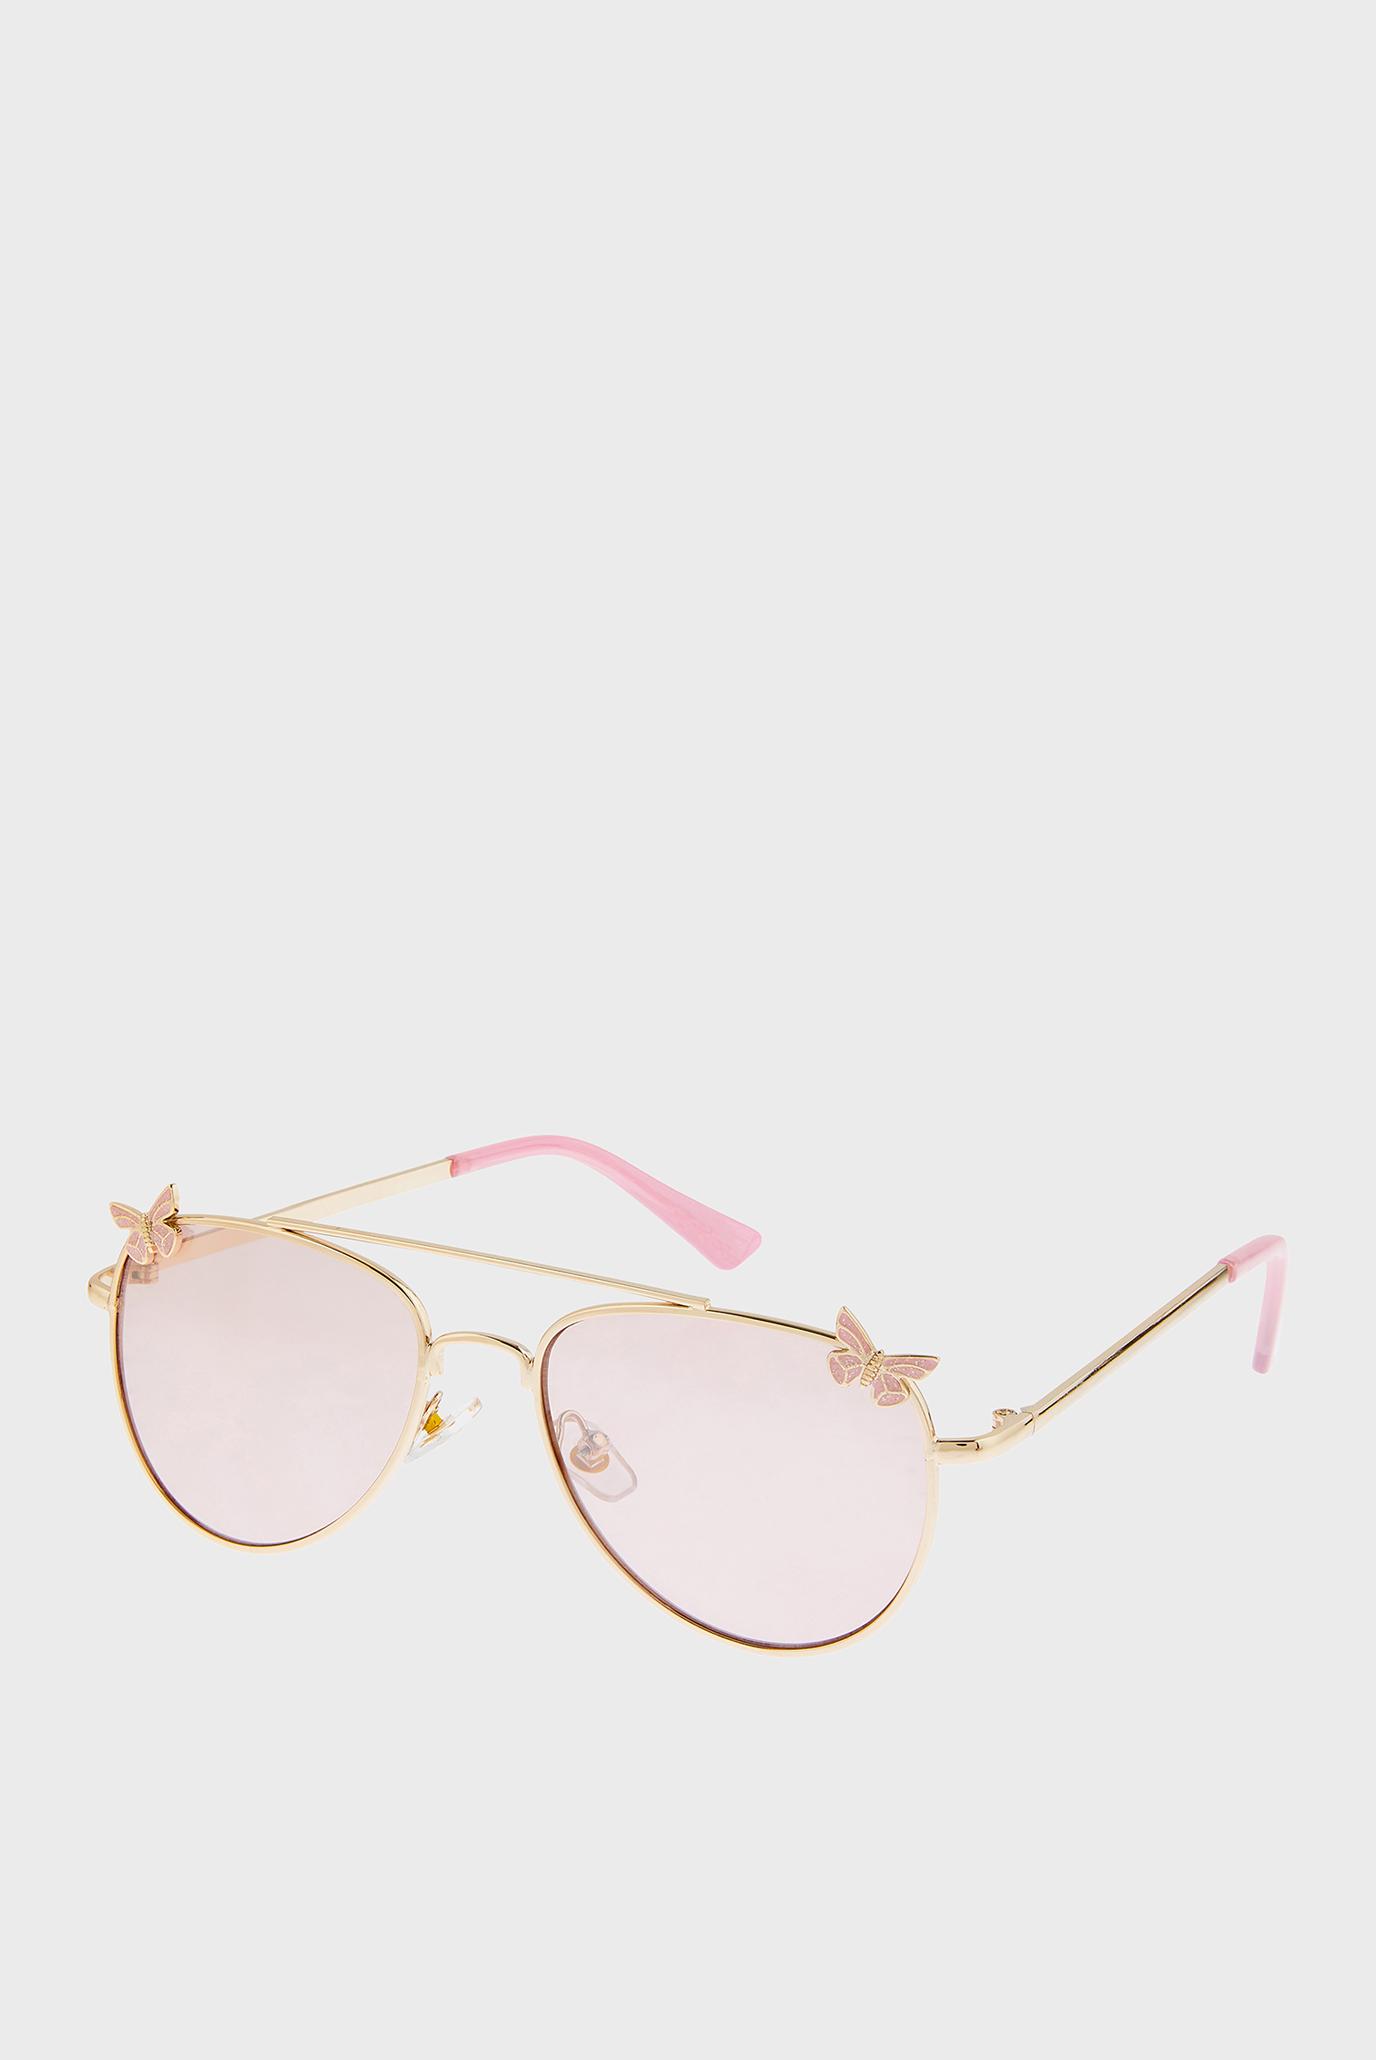 Дитячі золотисті окуляри BUTTERFLY AVIATO 1